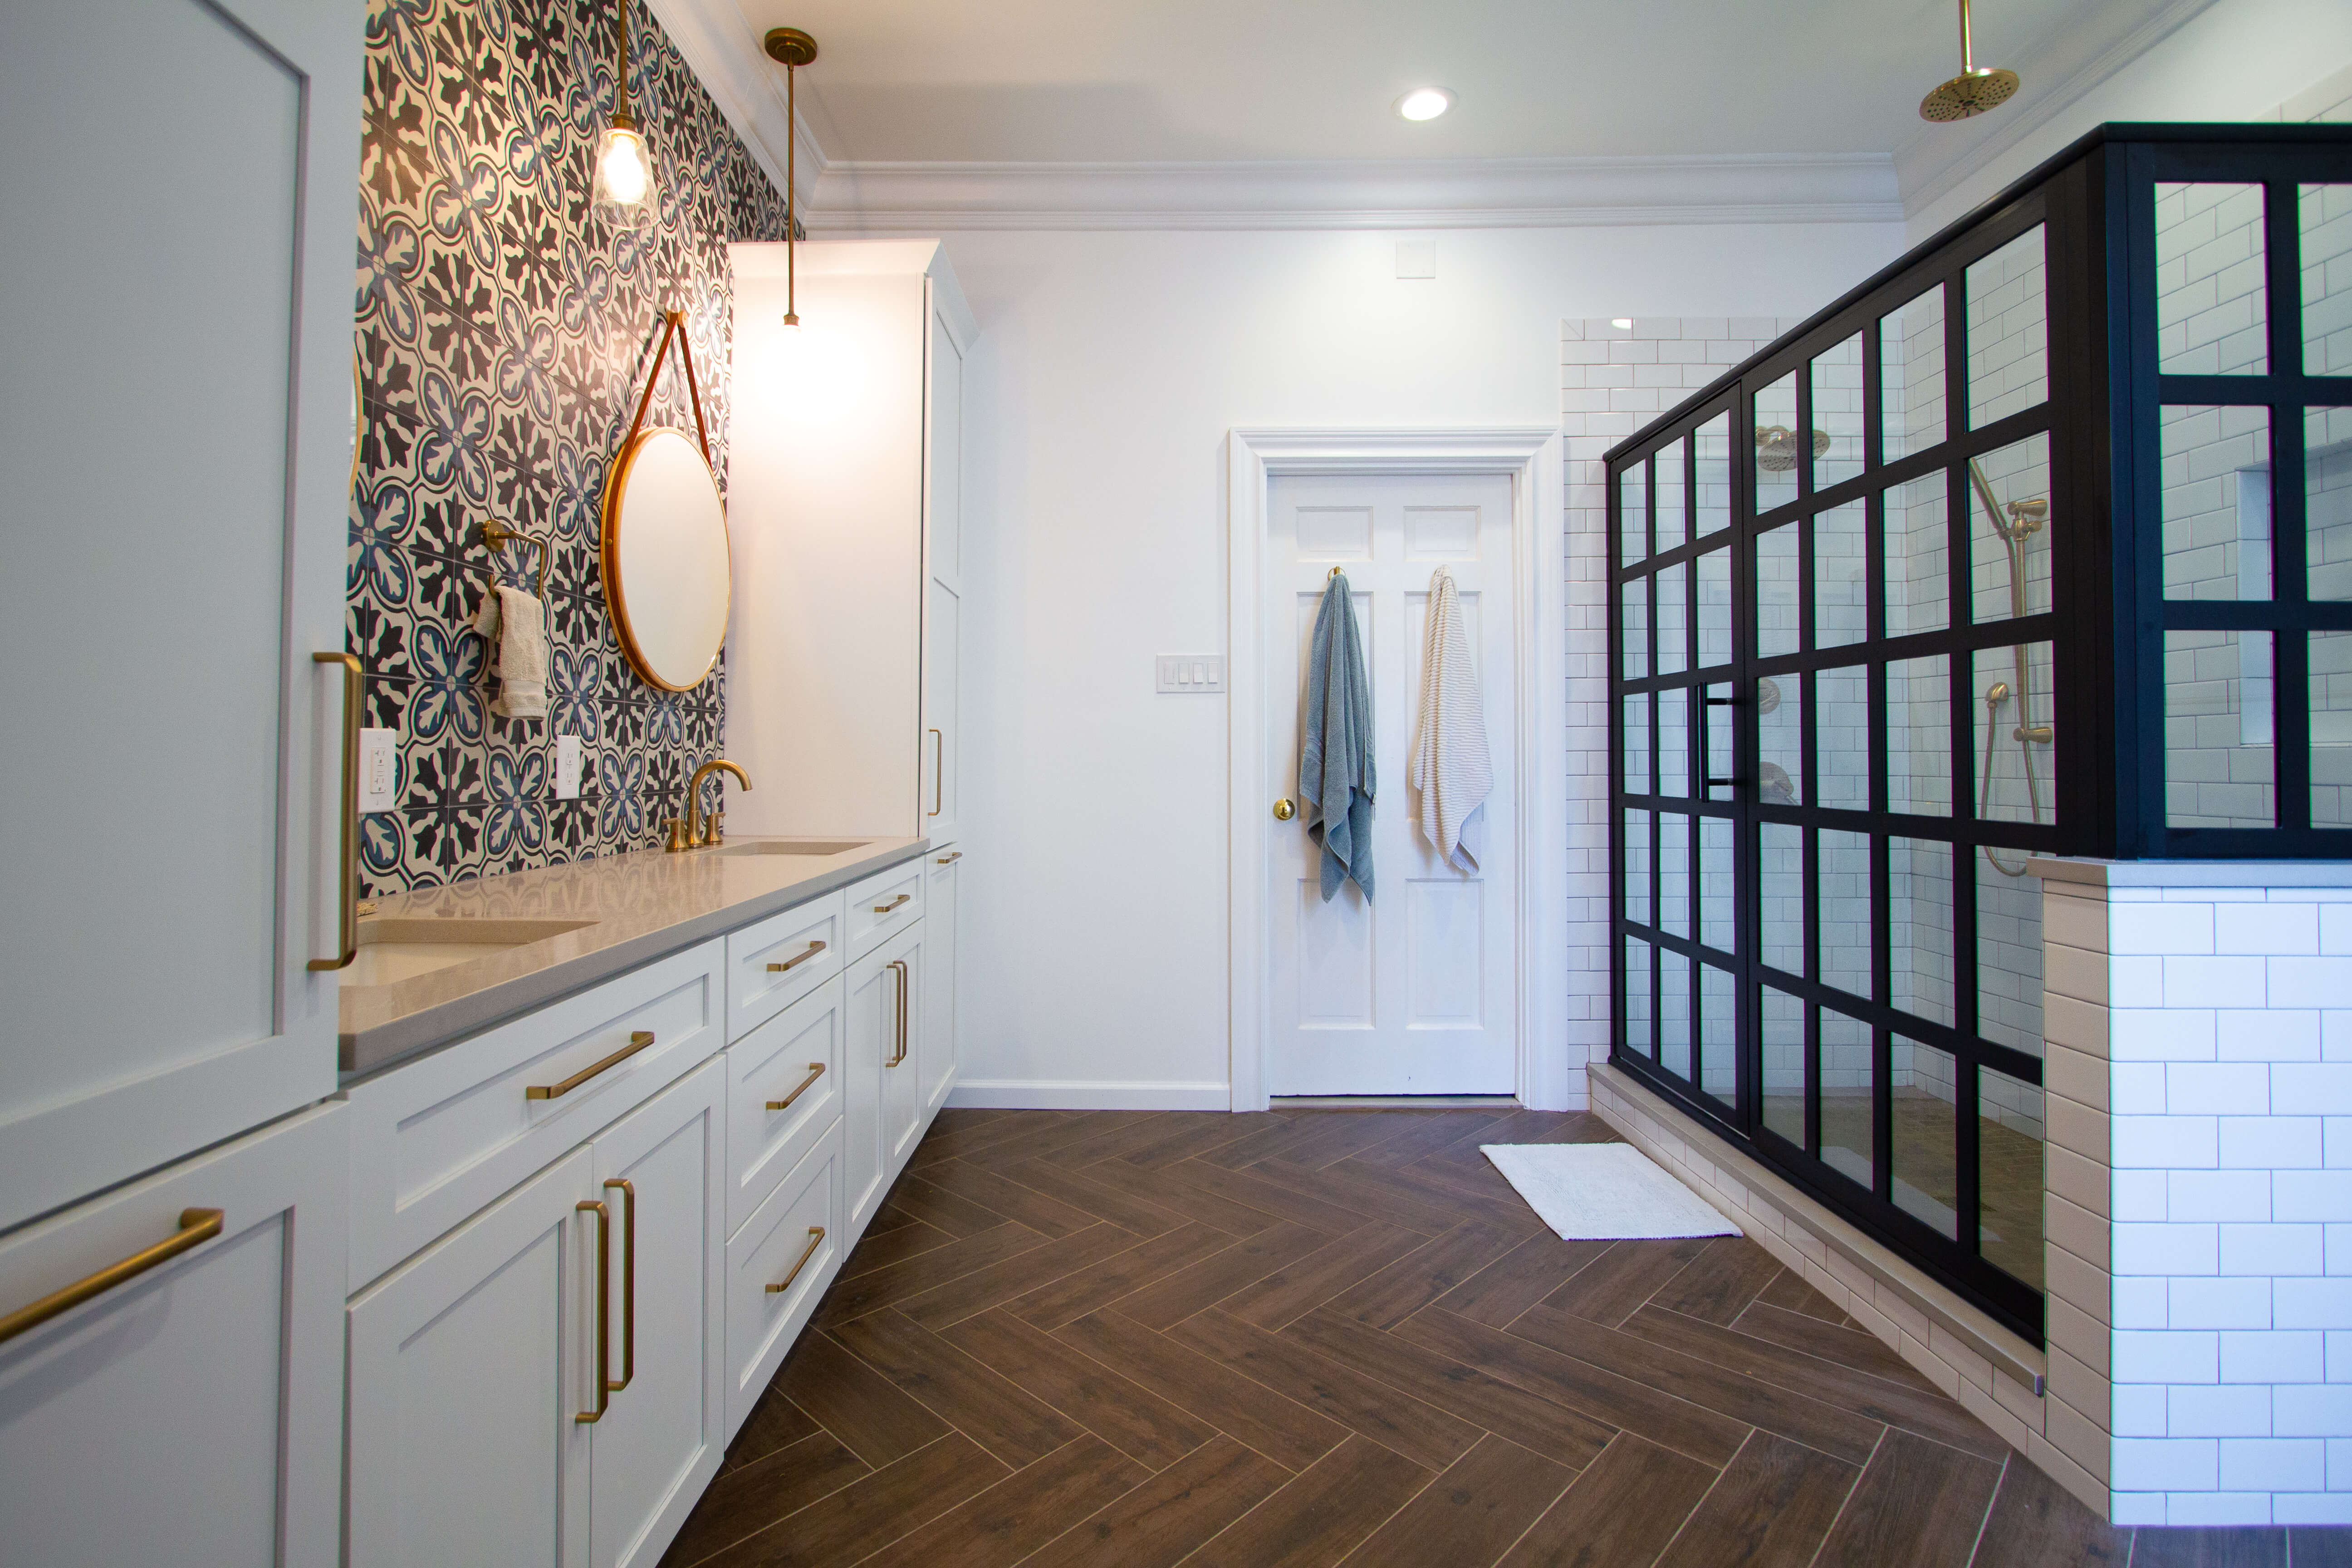 Design by designer Devin Mearig of dRemodeling, Pennsylvania featuring Dura Supreme Cabinetry.